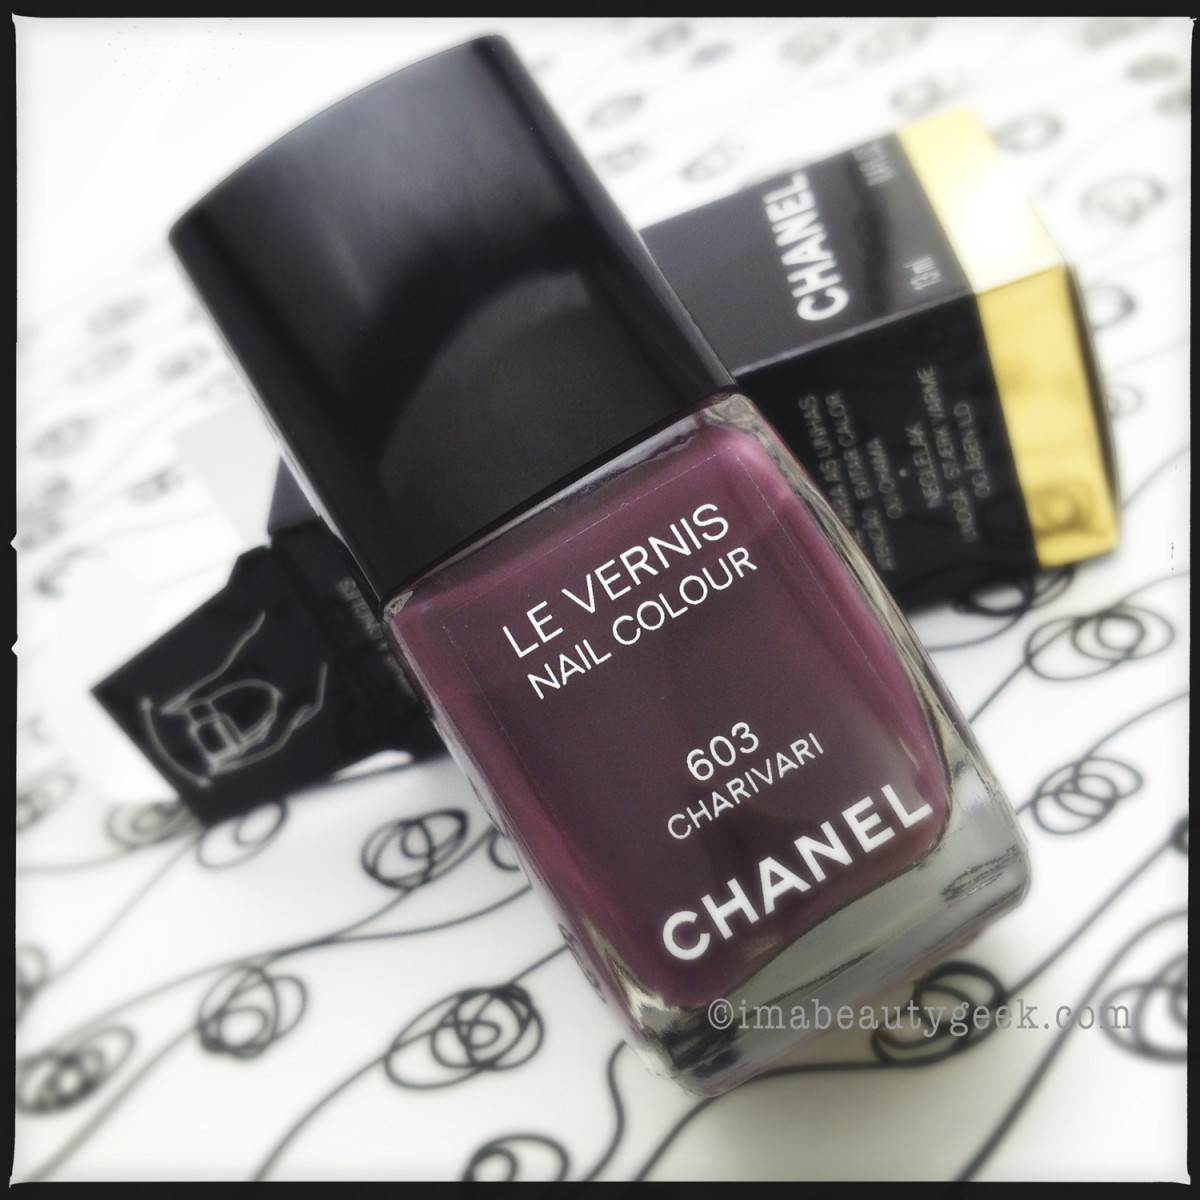 Chanel Charivari Bottle